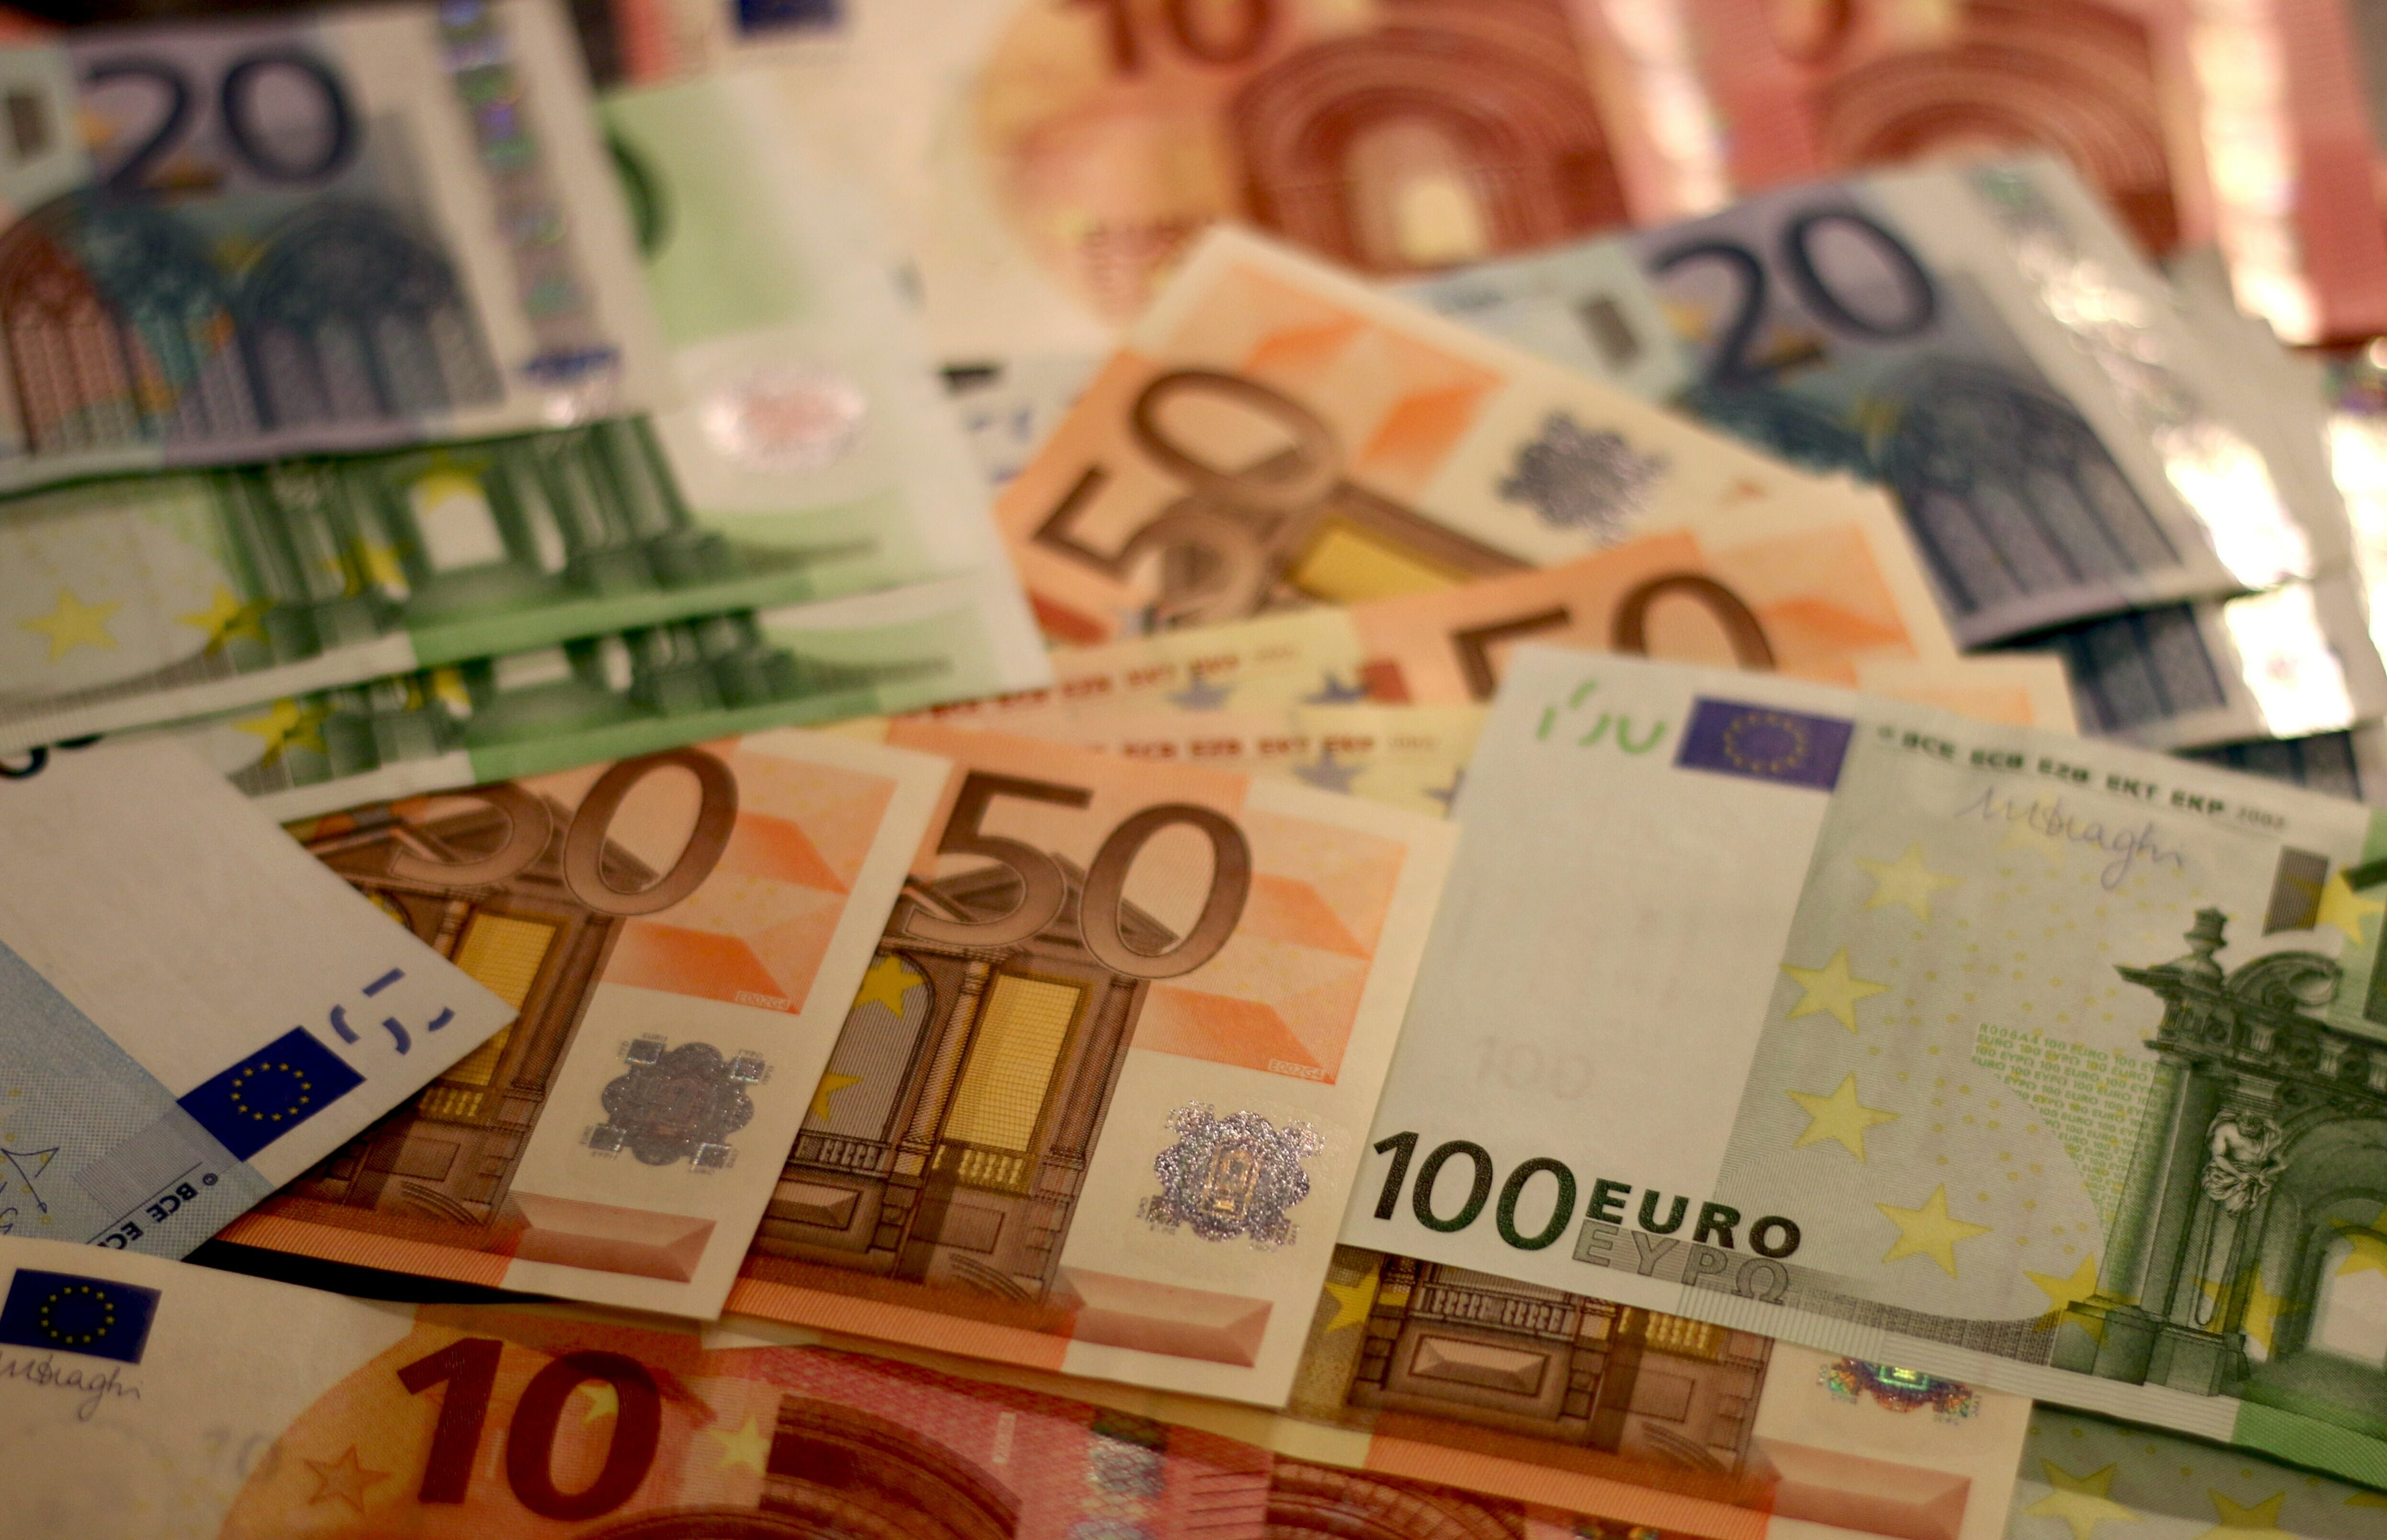 Tariferhöhung bei Caritas – 7,5 % mehr Gehalt